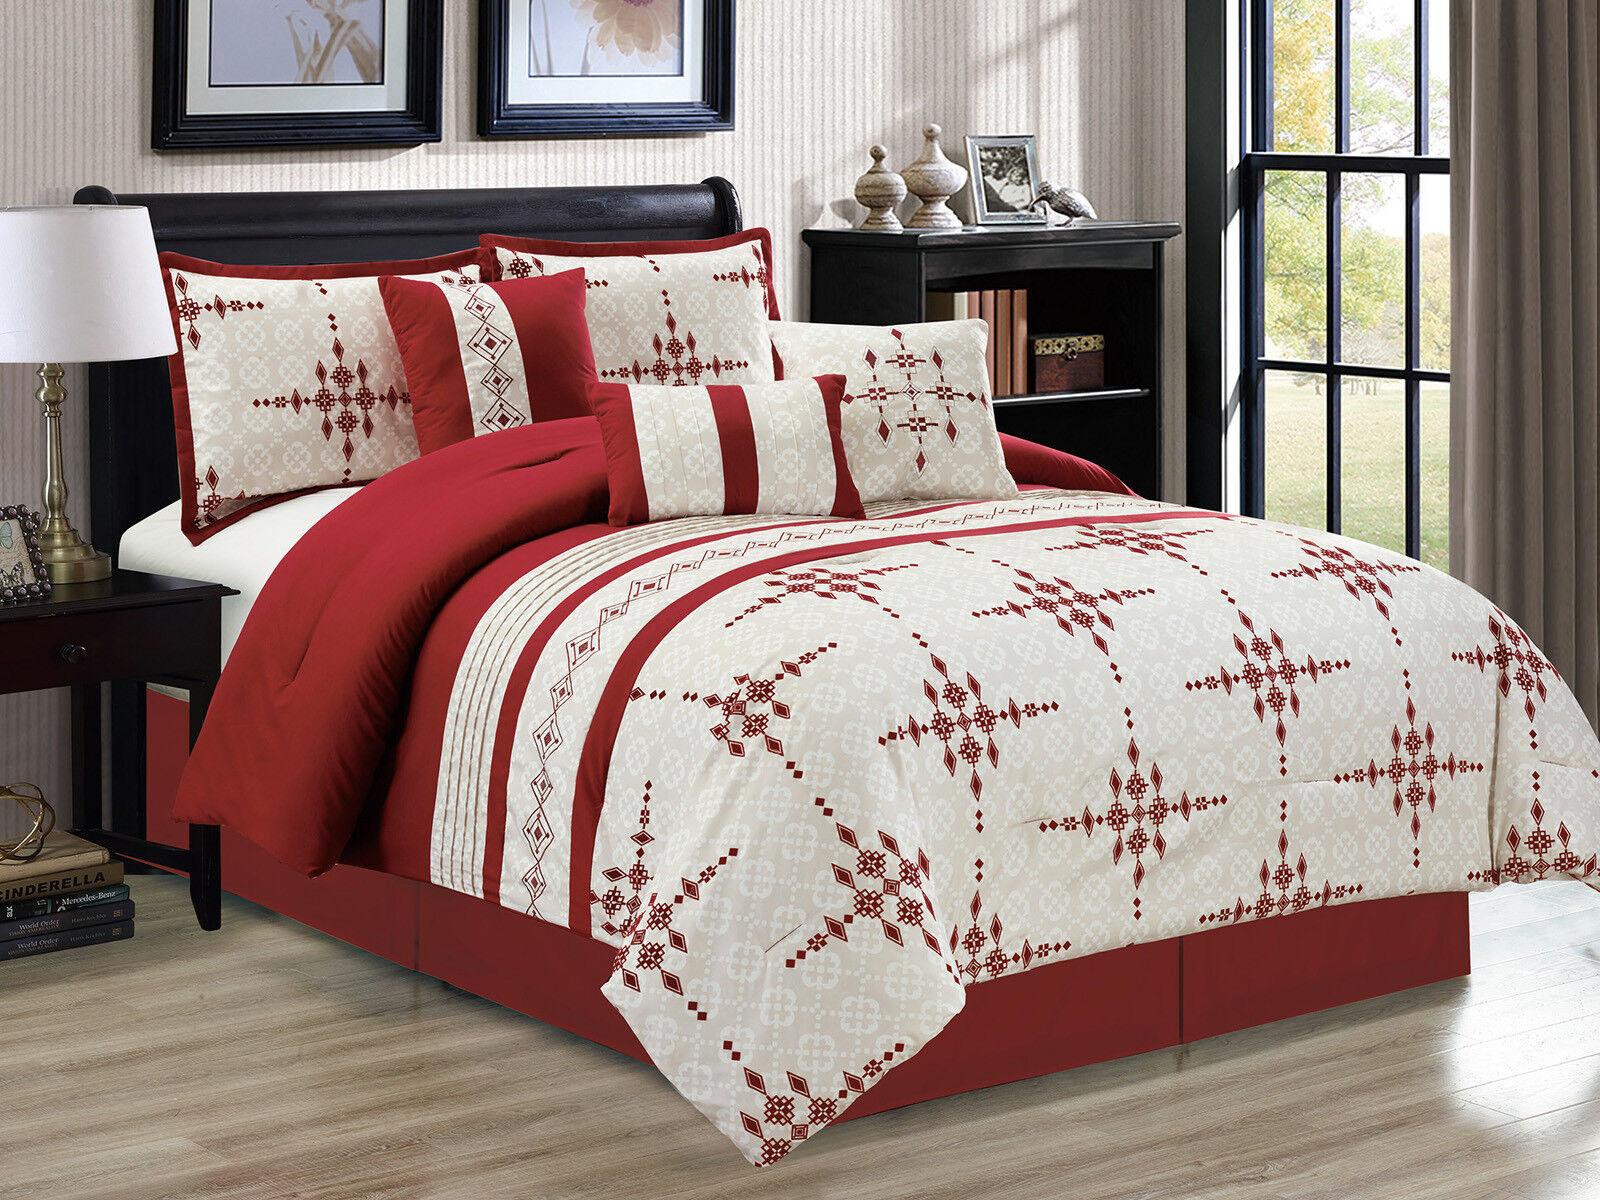 7-Pc Safi Diamond Star Embroidery Trellis Comforter Set Burgundy Red Beige King